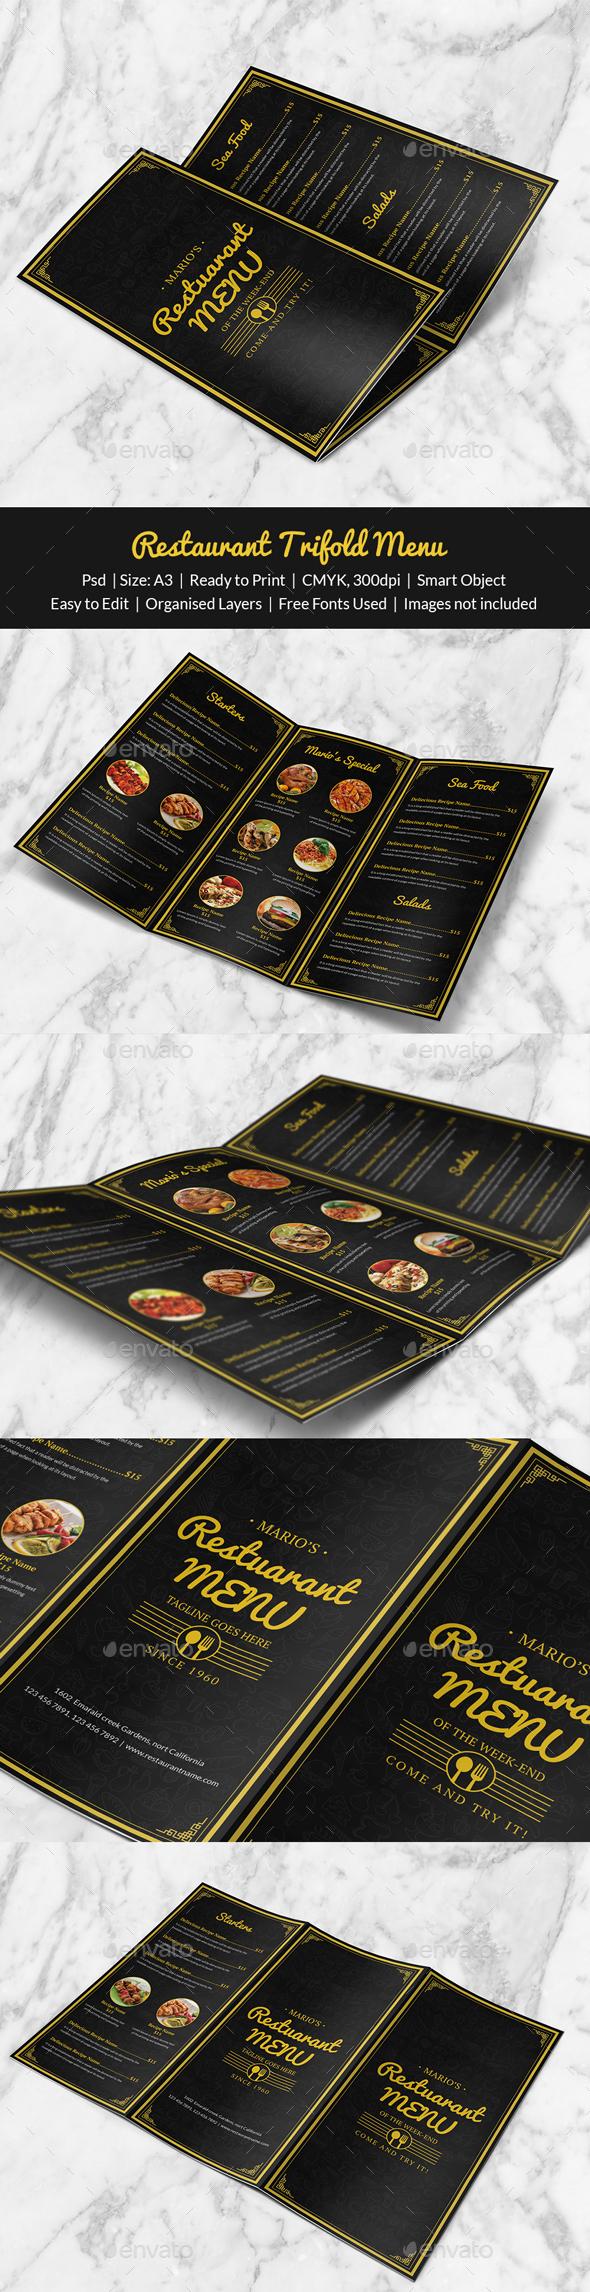 Restaurant Trifold Menu - Print Templates